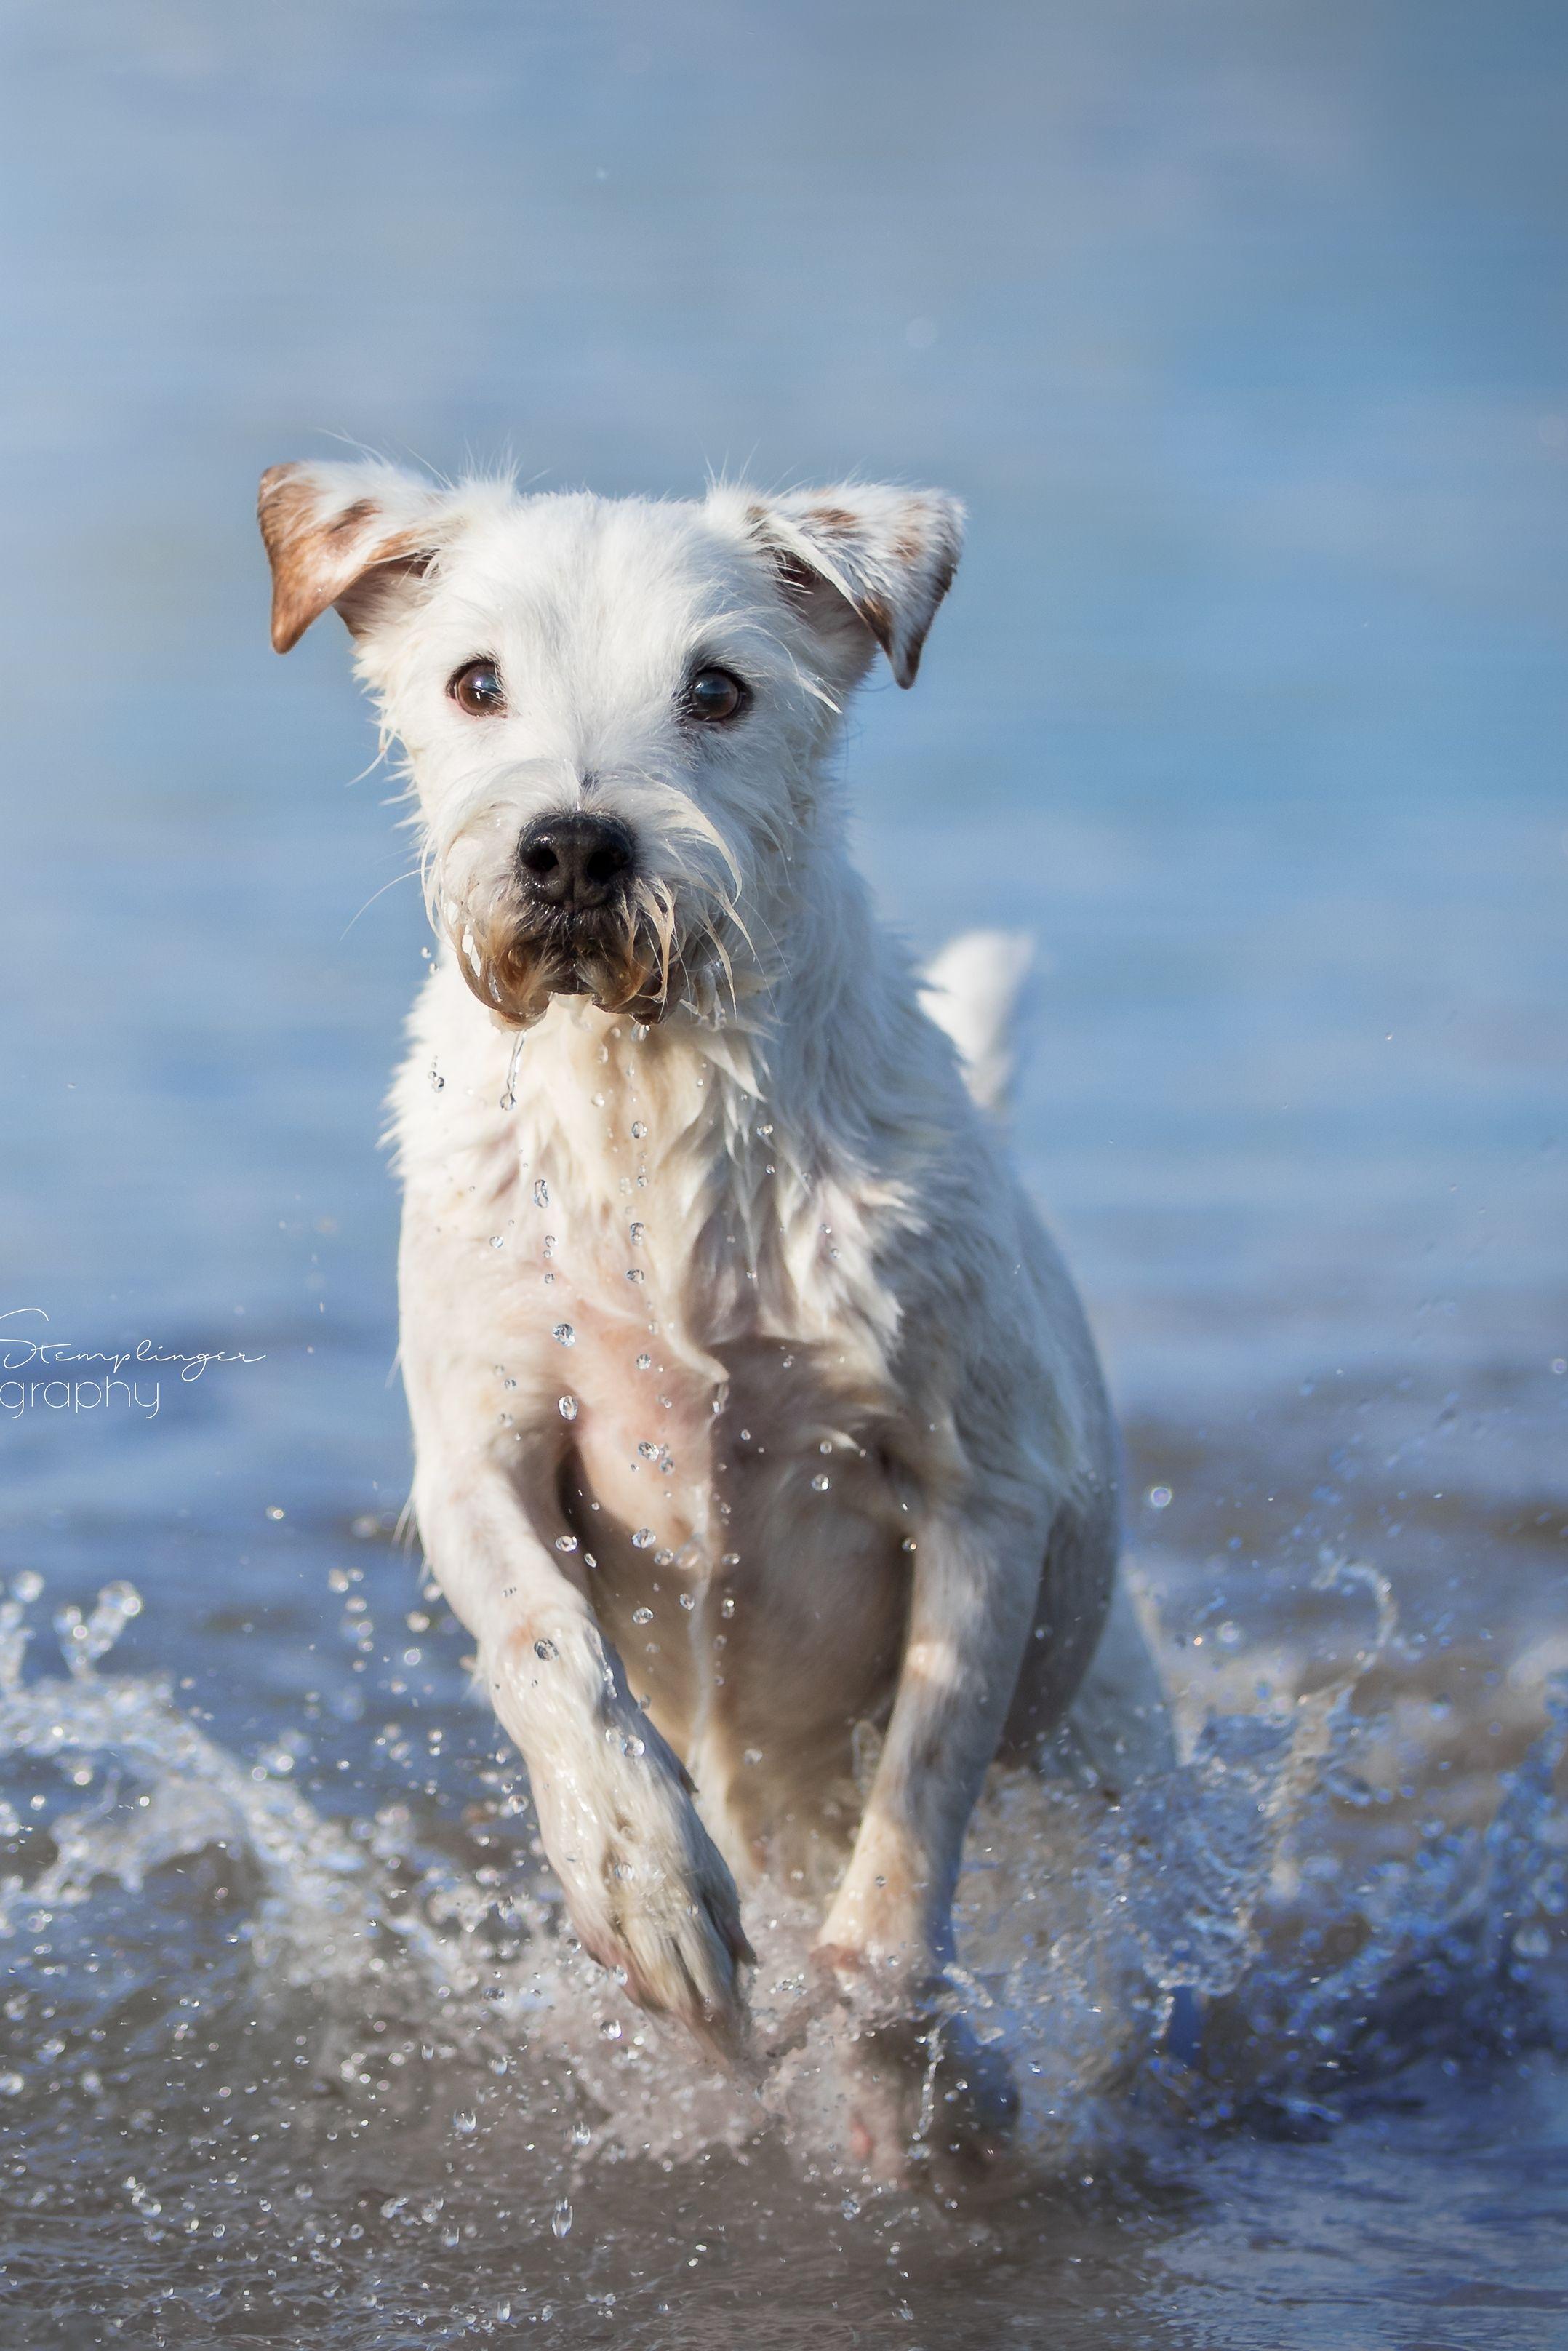 Hundefotos Im Wasser Fotografen Fur Susse Hundebilder In Deiner Nahe Finden In 2020 Hunde Fotos Tierfotografie Hundefotos